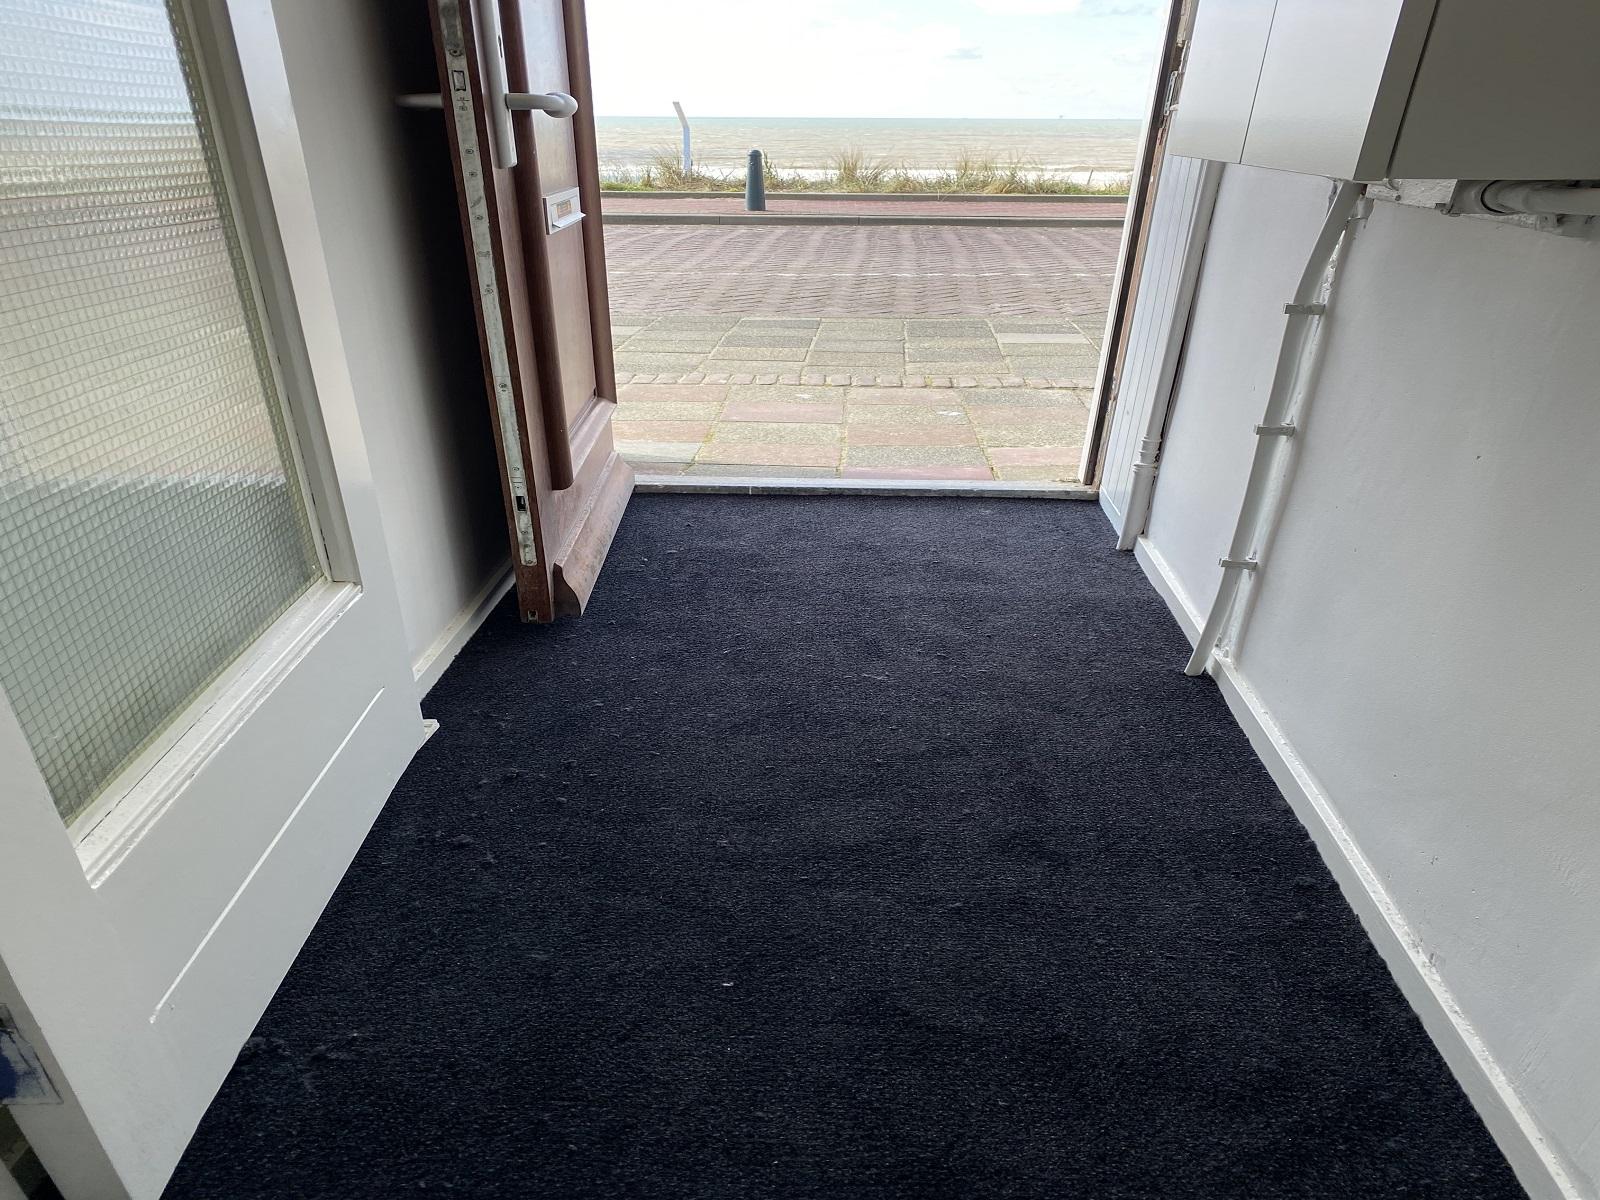 Bacovloeren trap en hal renovatie 5